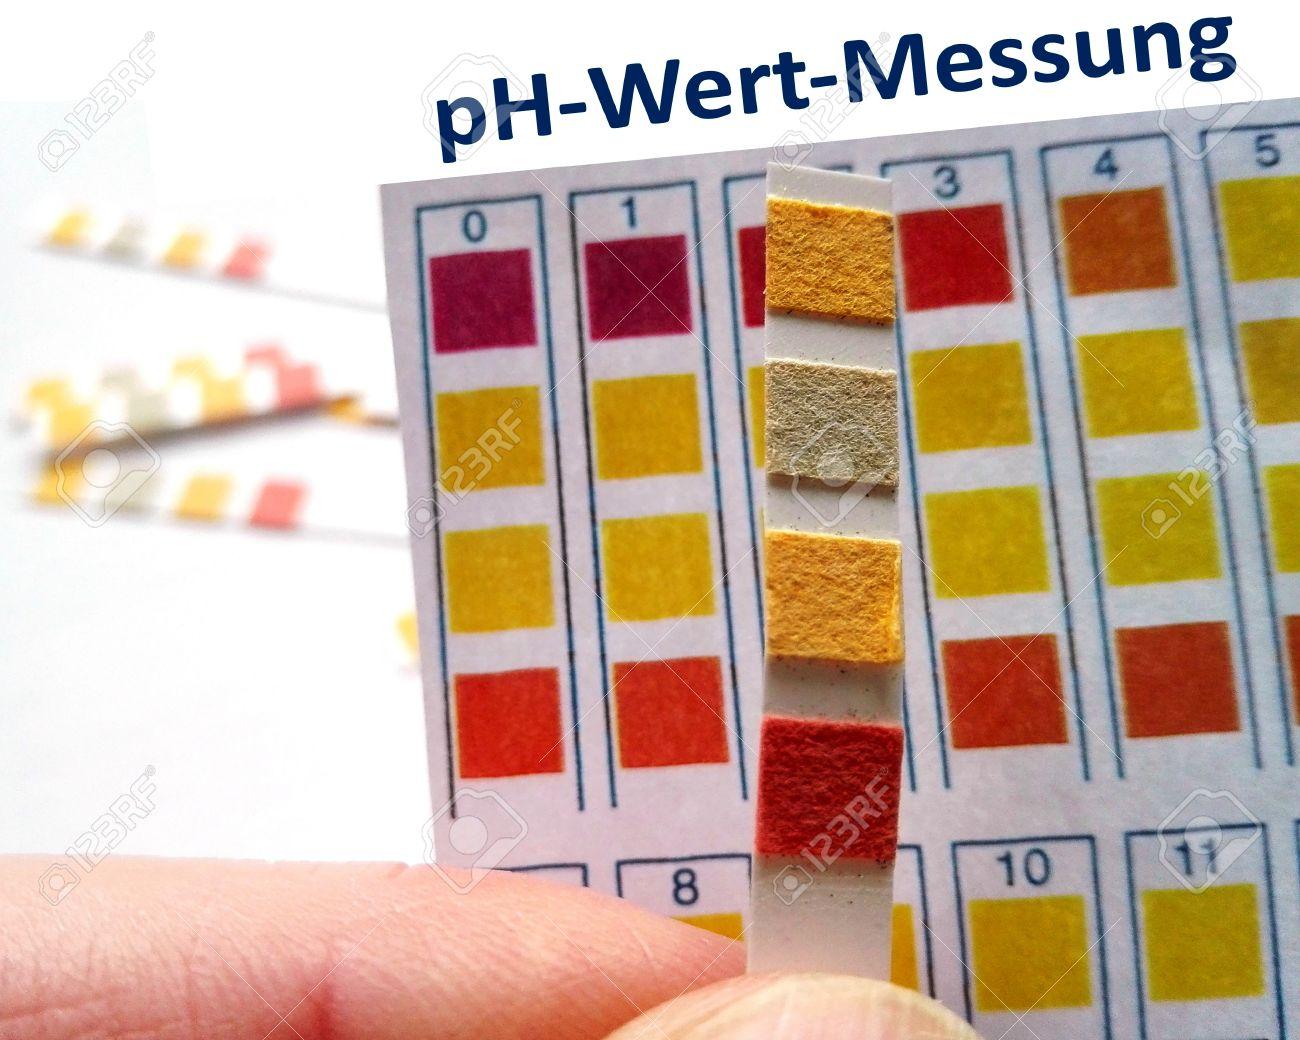 PH value measurement - value Rods for measuring the acid content, pH (German version) - 70156328